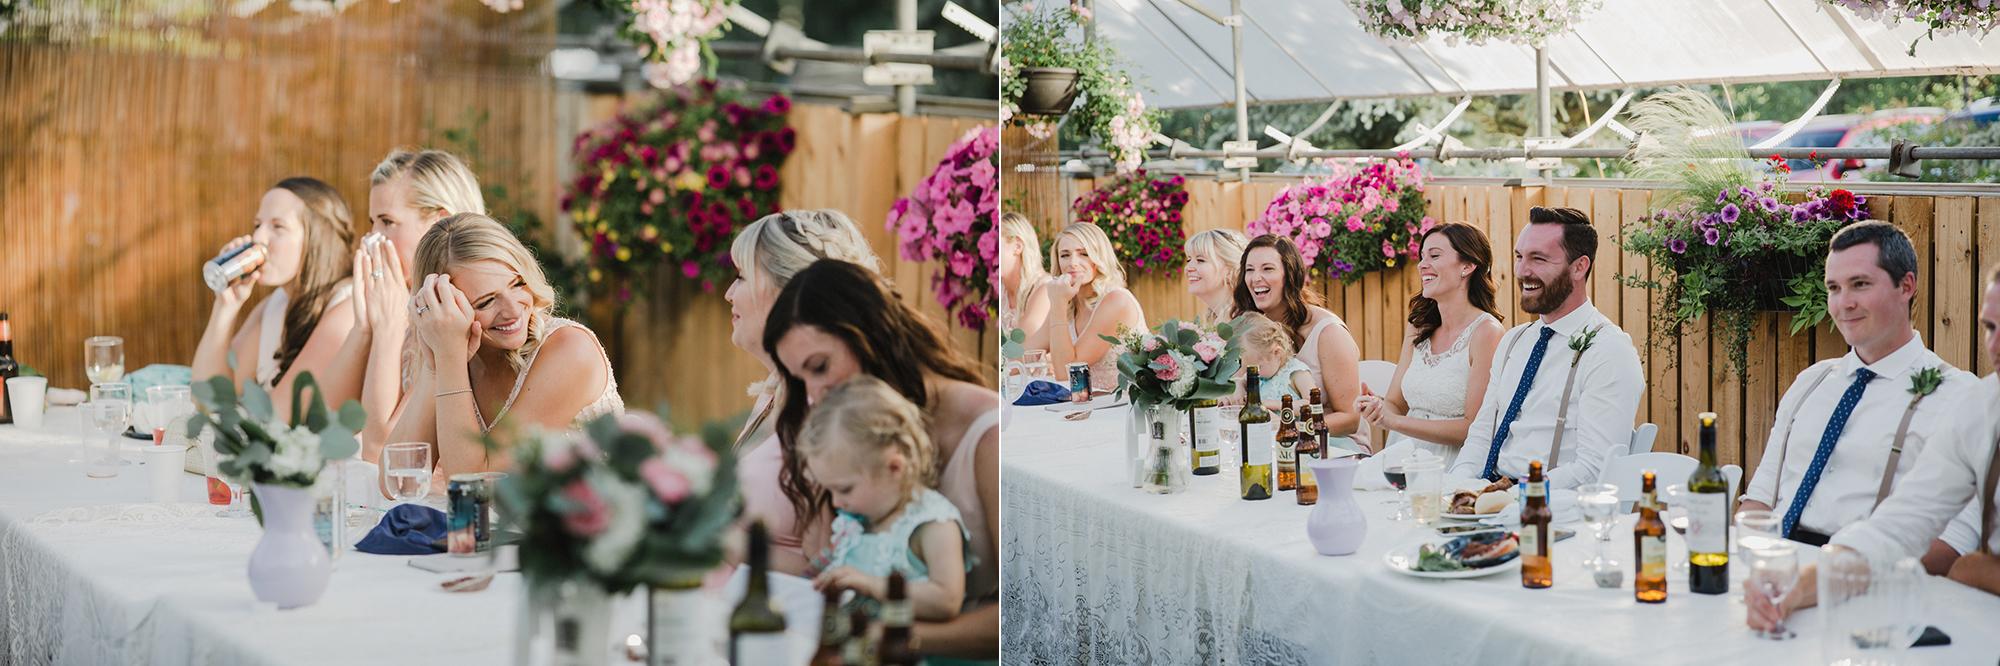 Flower Farm Crowsnest Pass Wedding -117.JPG